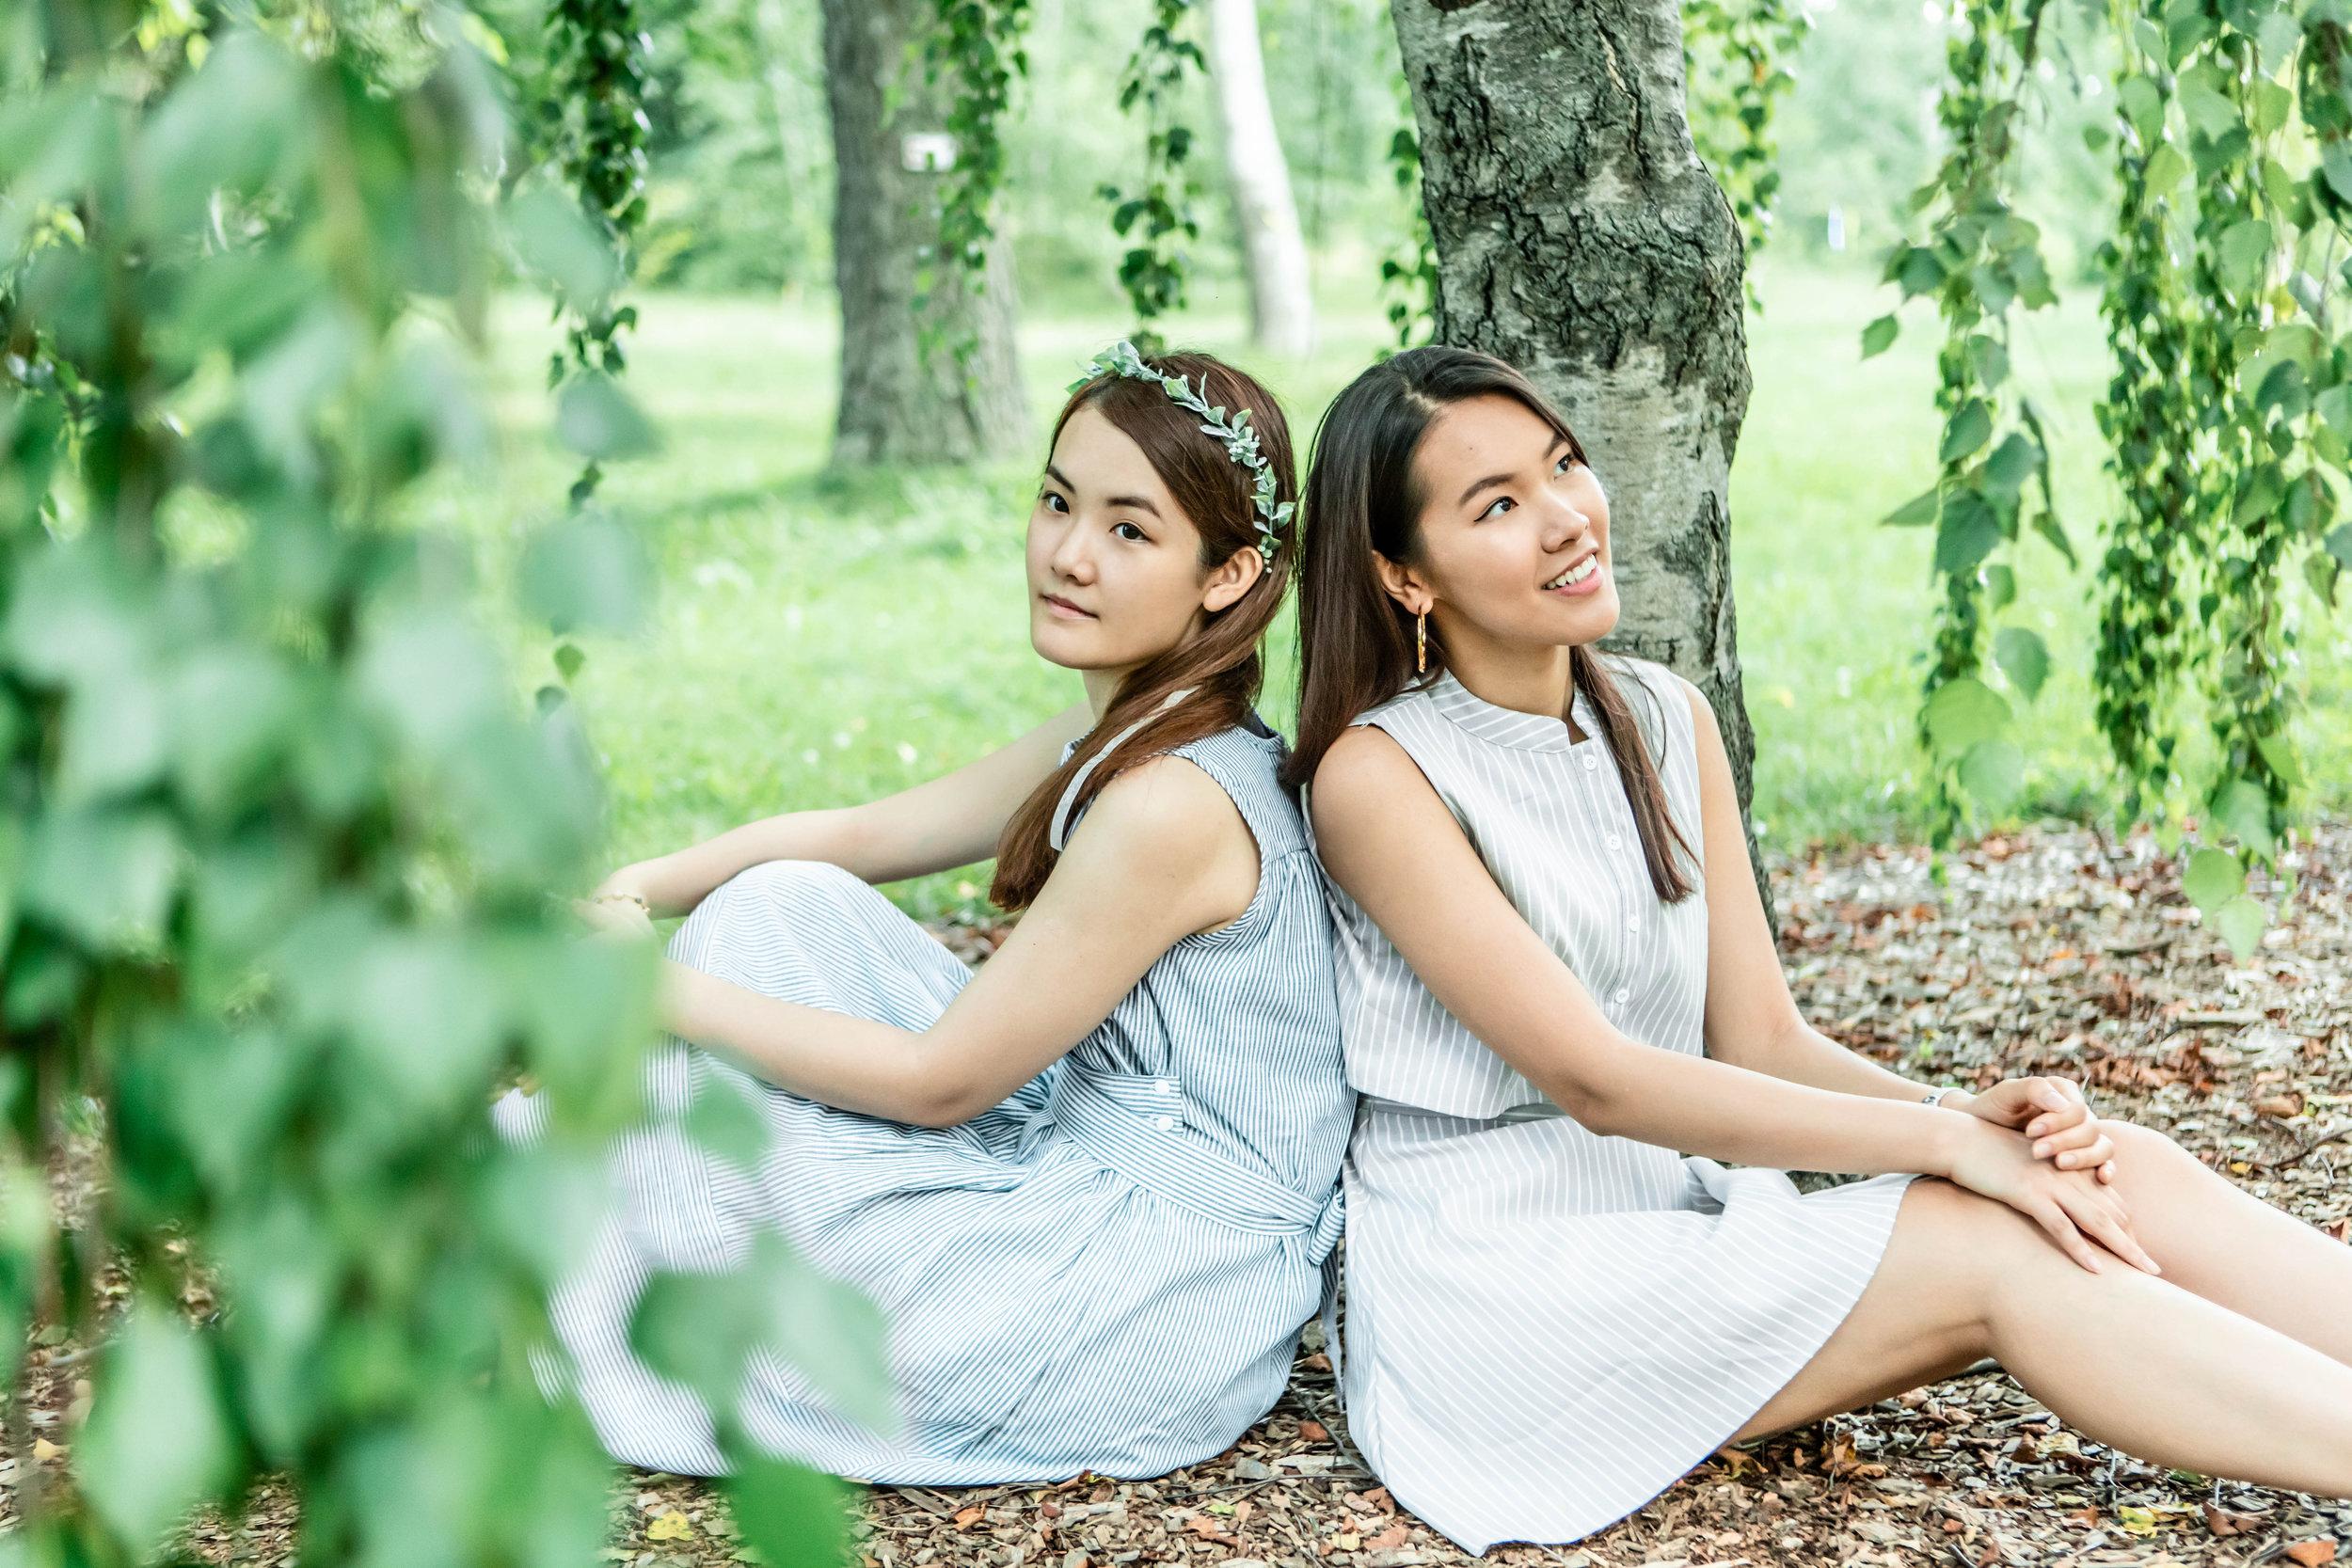 sisters-in-summertime-eva-loh-01.jpg